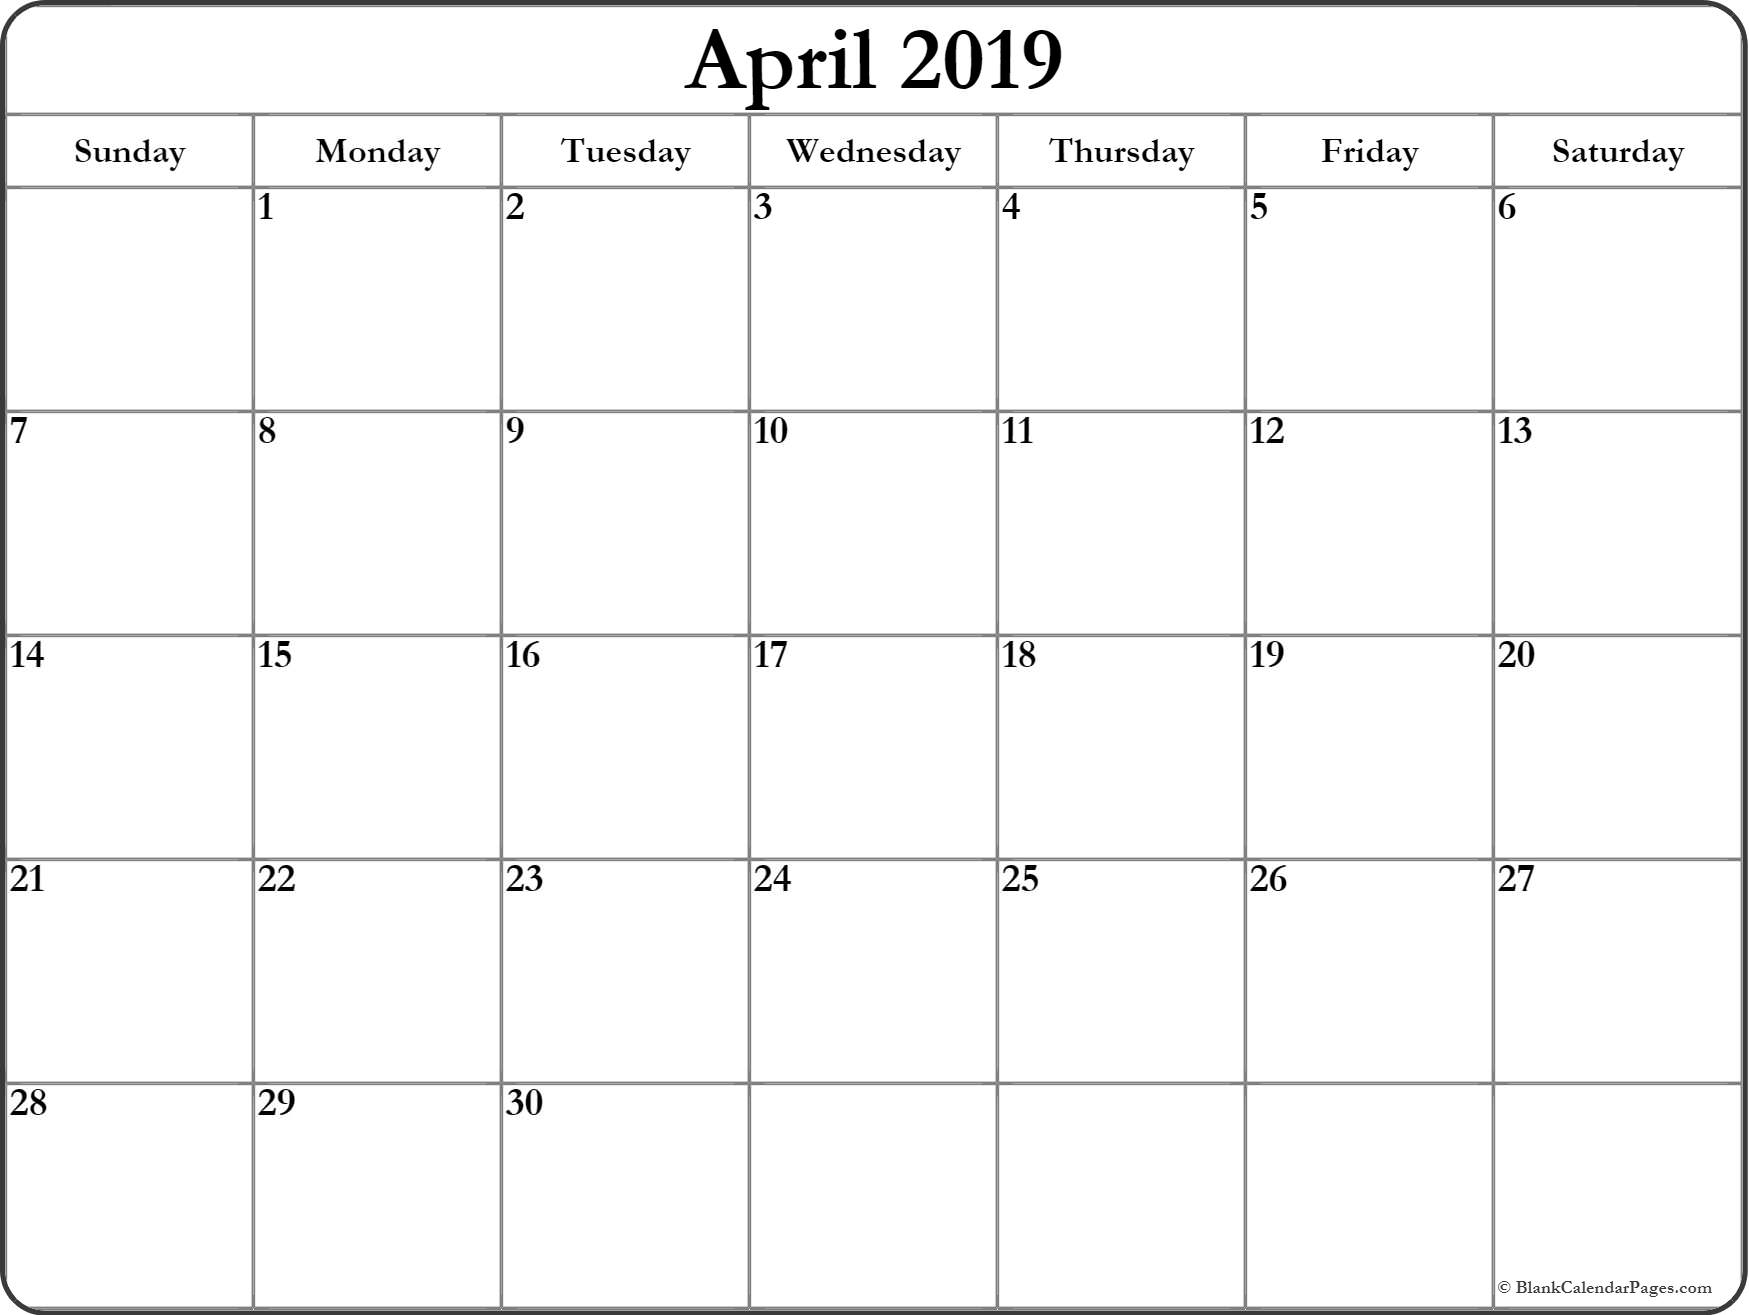 Printable Blank Calendar April 2019 - Free Printable Calendar inside Free Printable Blank Calendar Templates